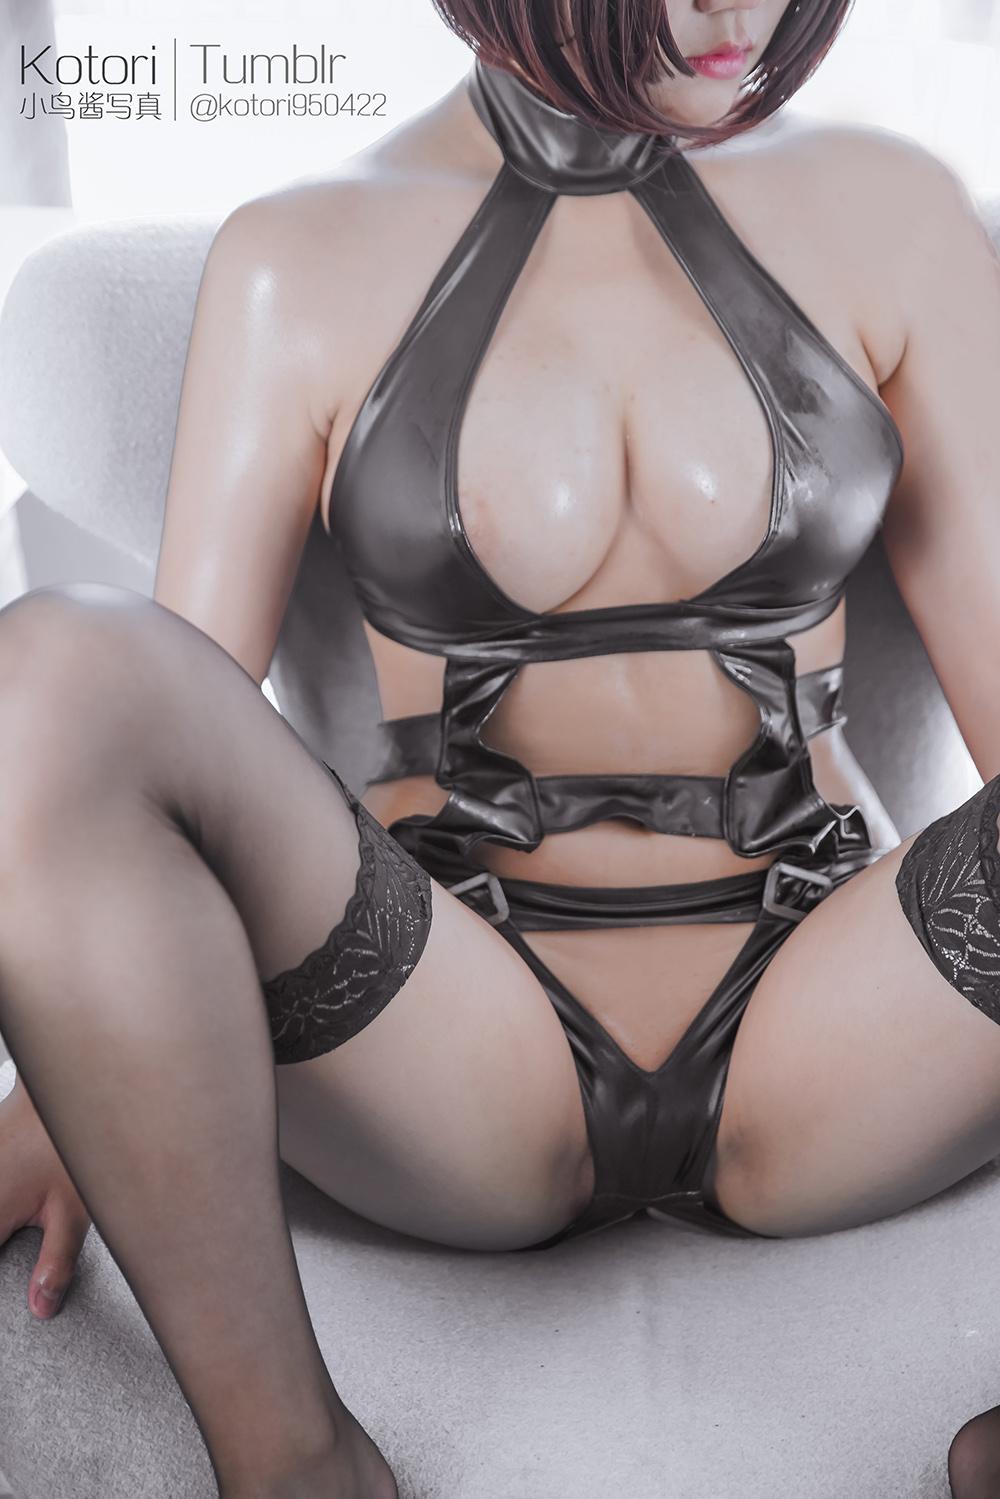 zkcG3V - Cosplay girl PR社 福利姬 小鸟酱系列–黑色束缚衣